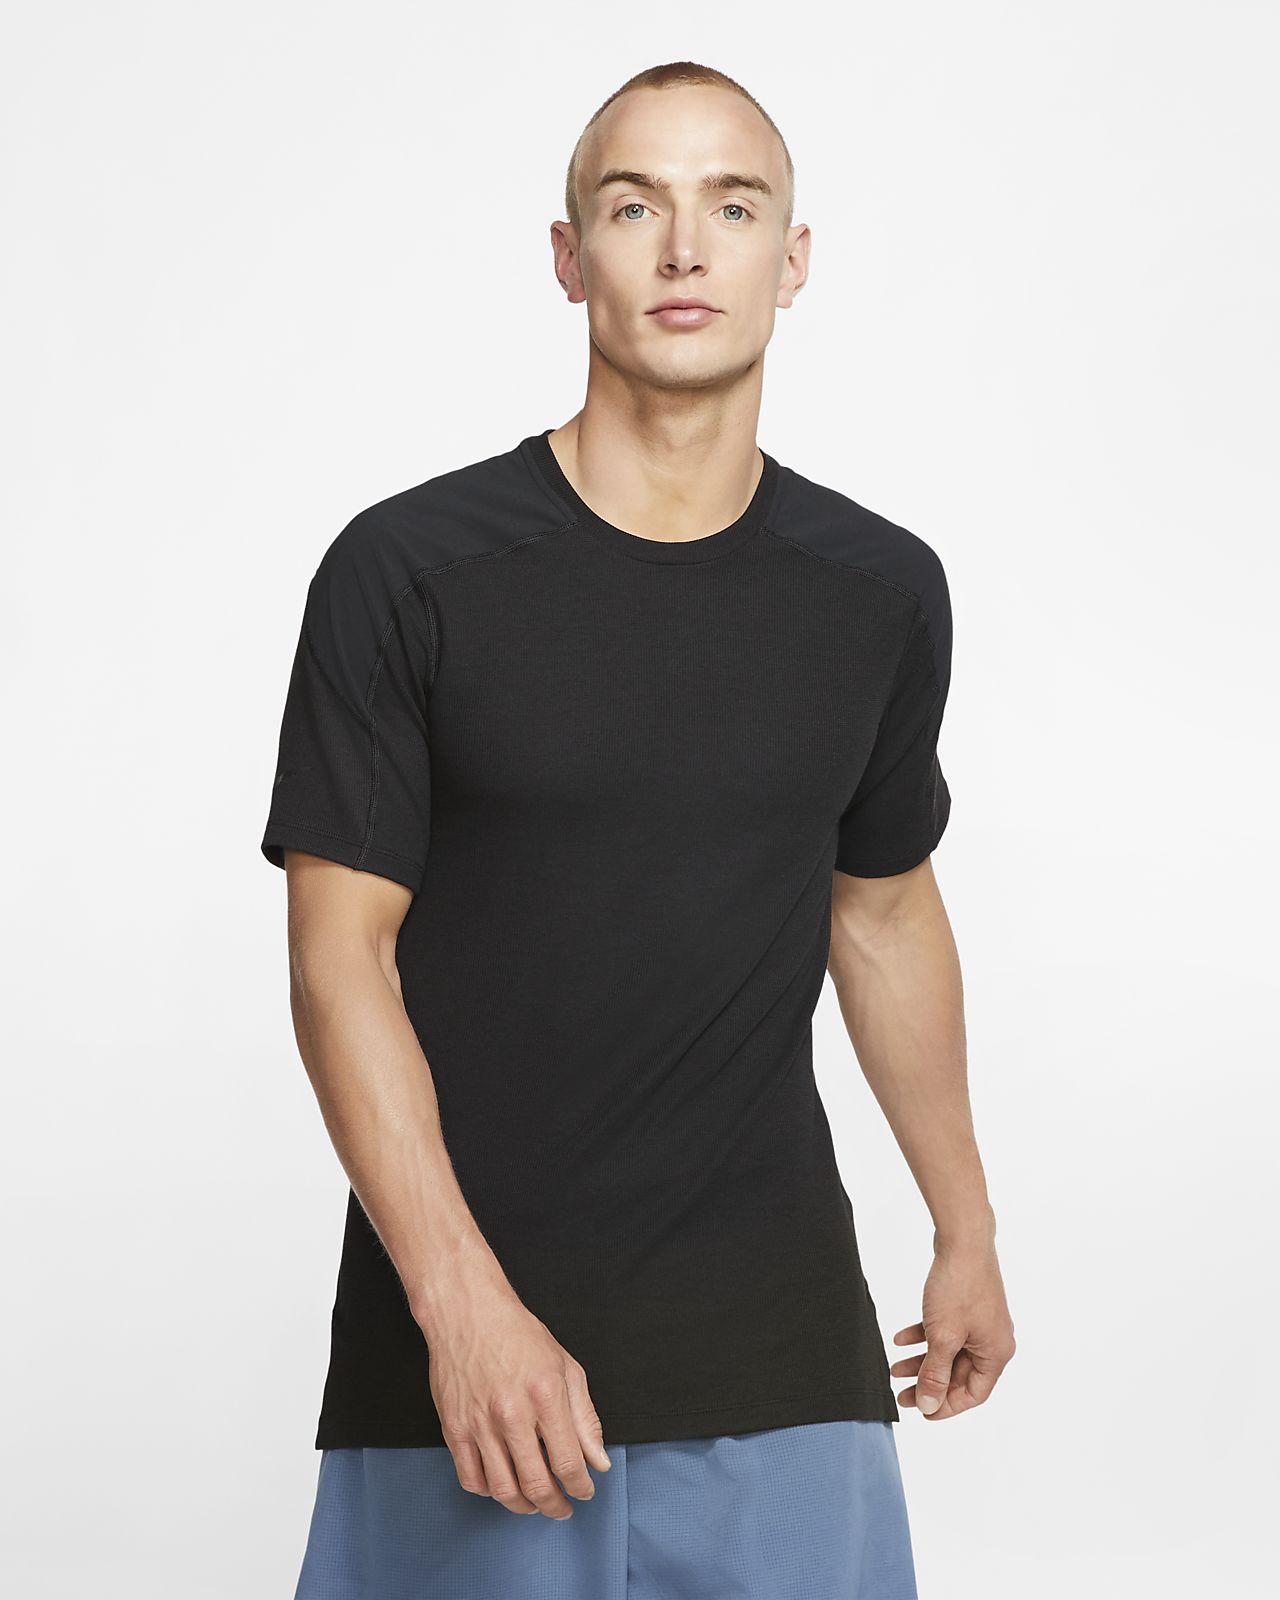 Nike Dri-FIT Men's Short-Sleeve Training Top